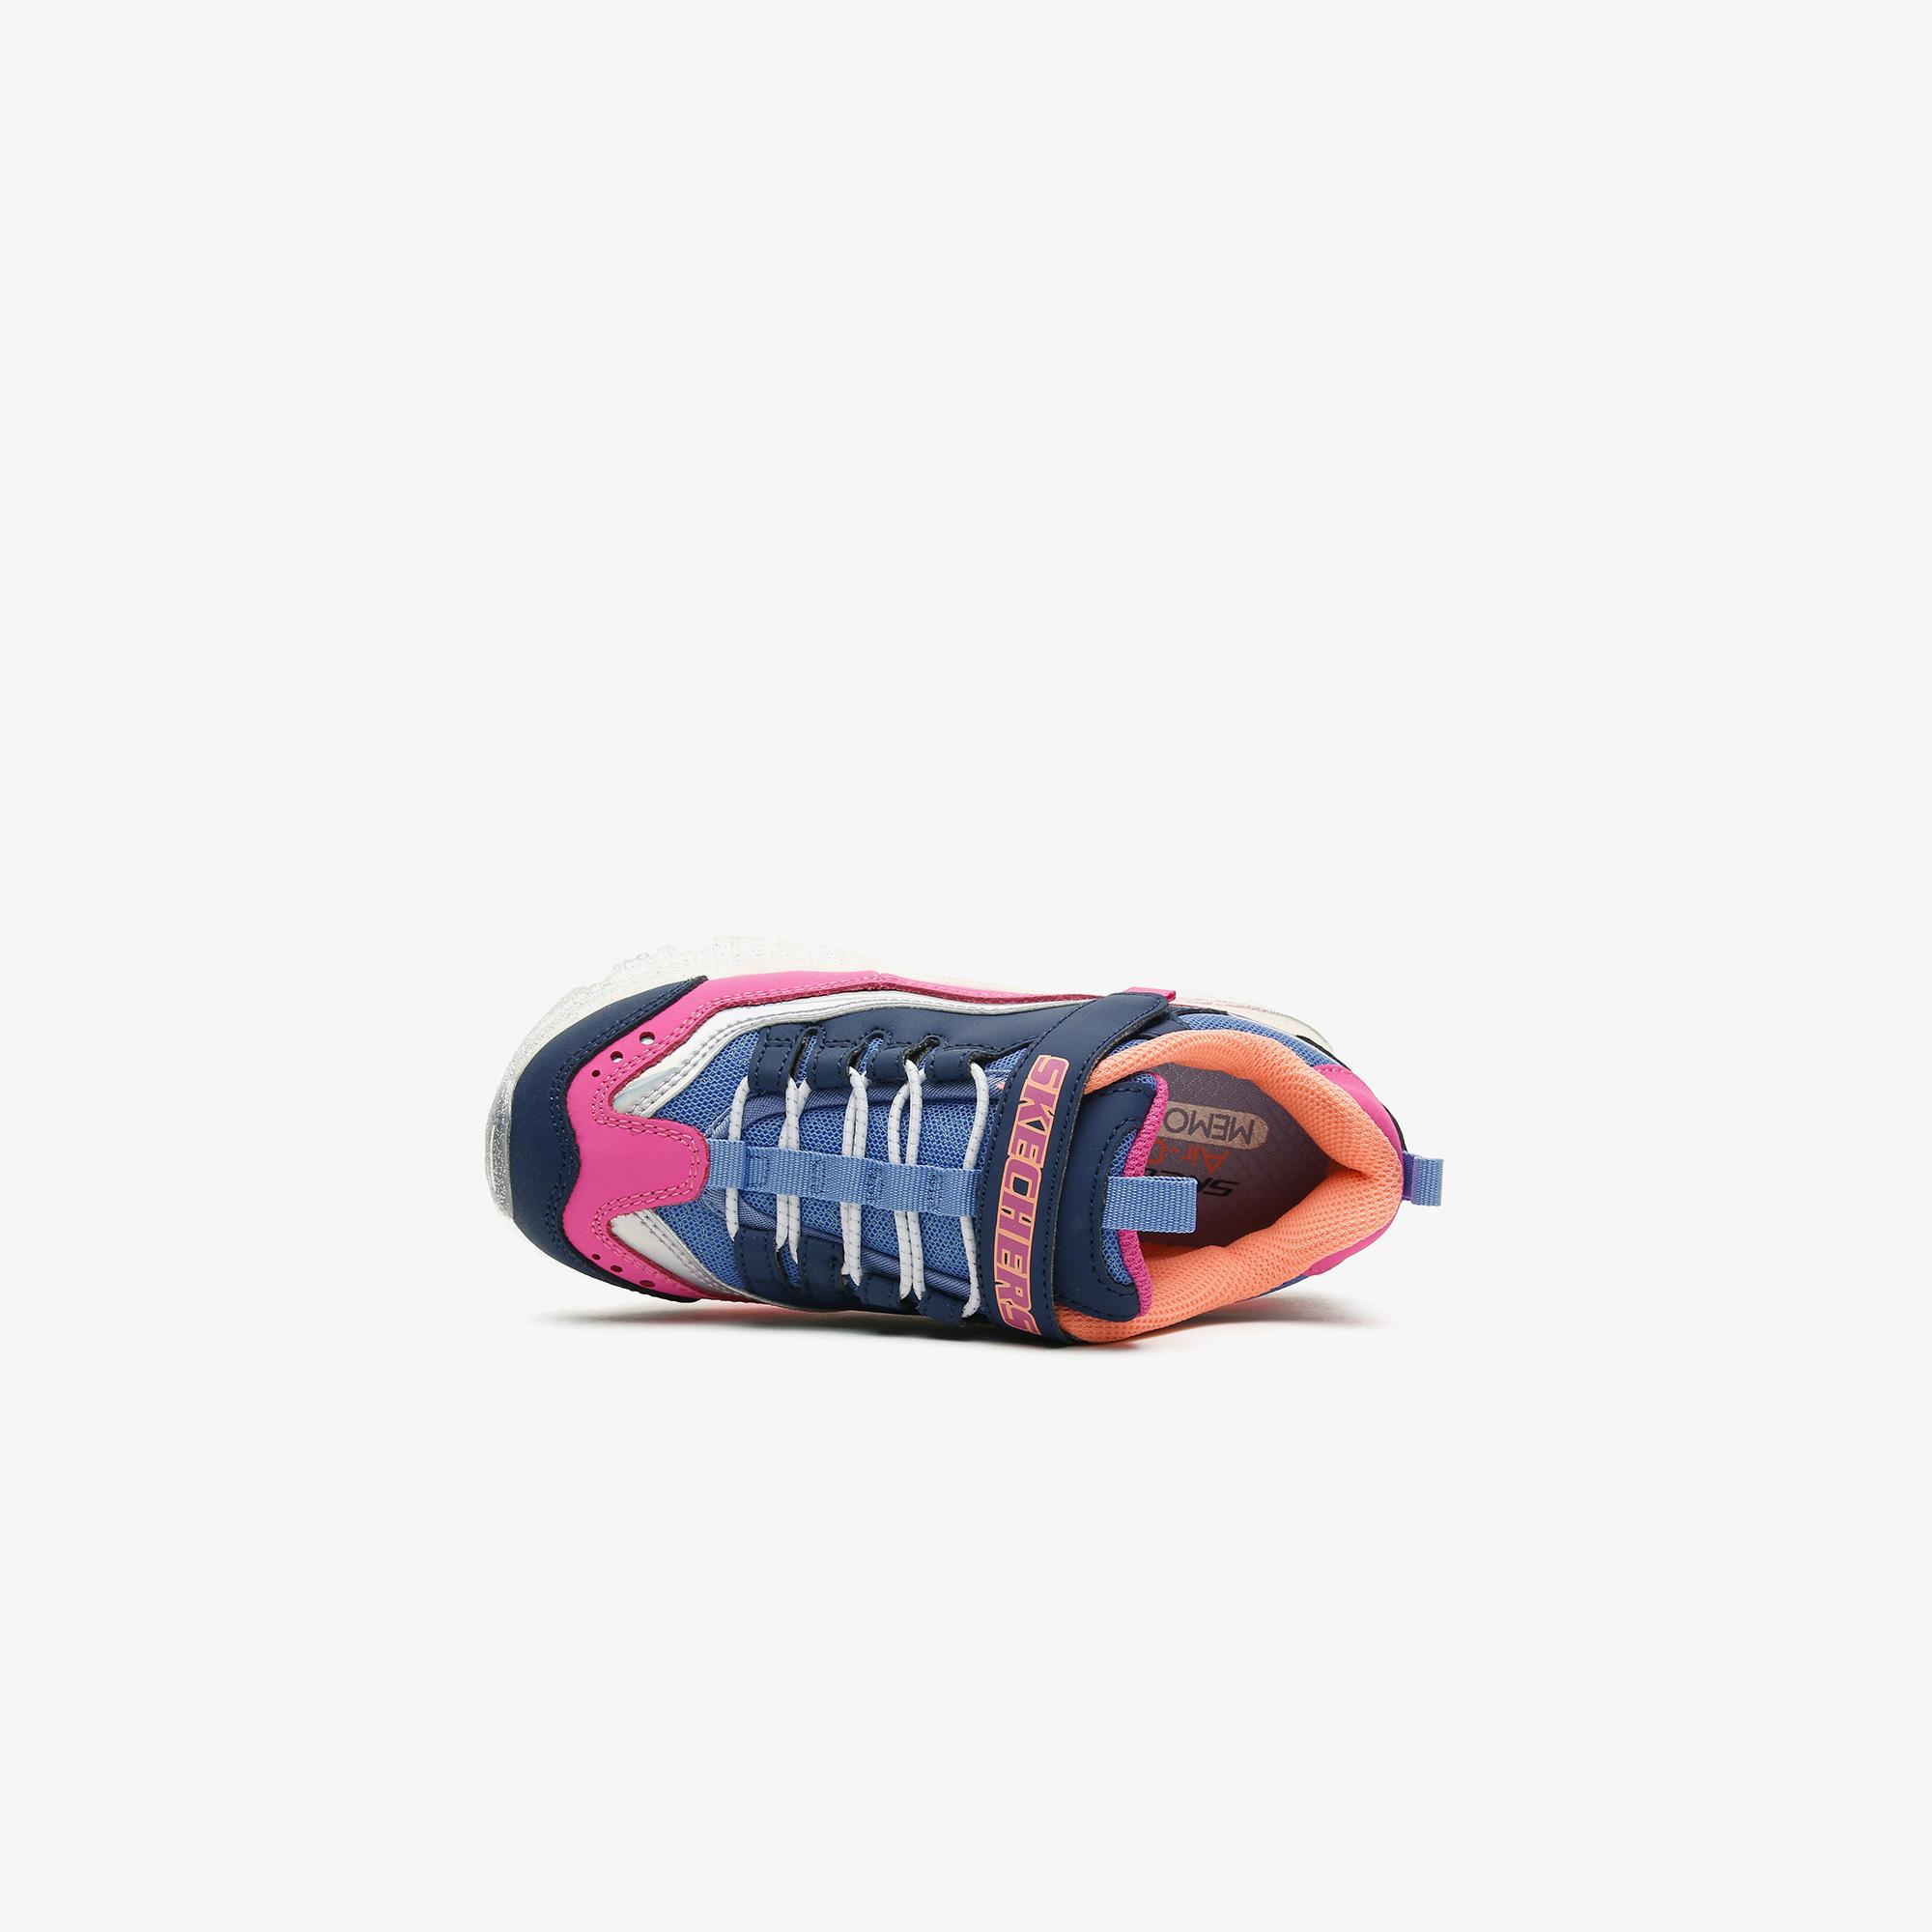 Skechers D'Lites - Electric Coloring Çocuk Lacivert Spor Ayakkabı